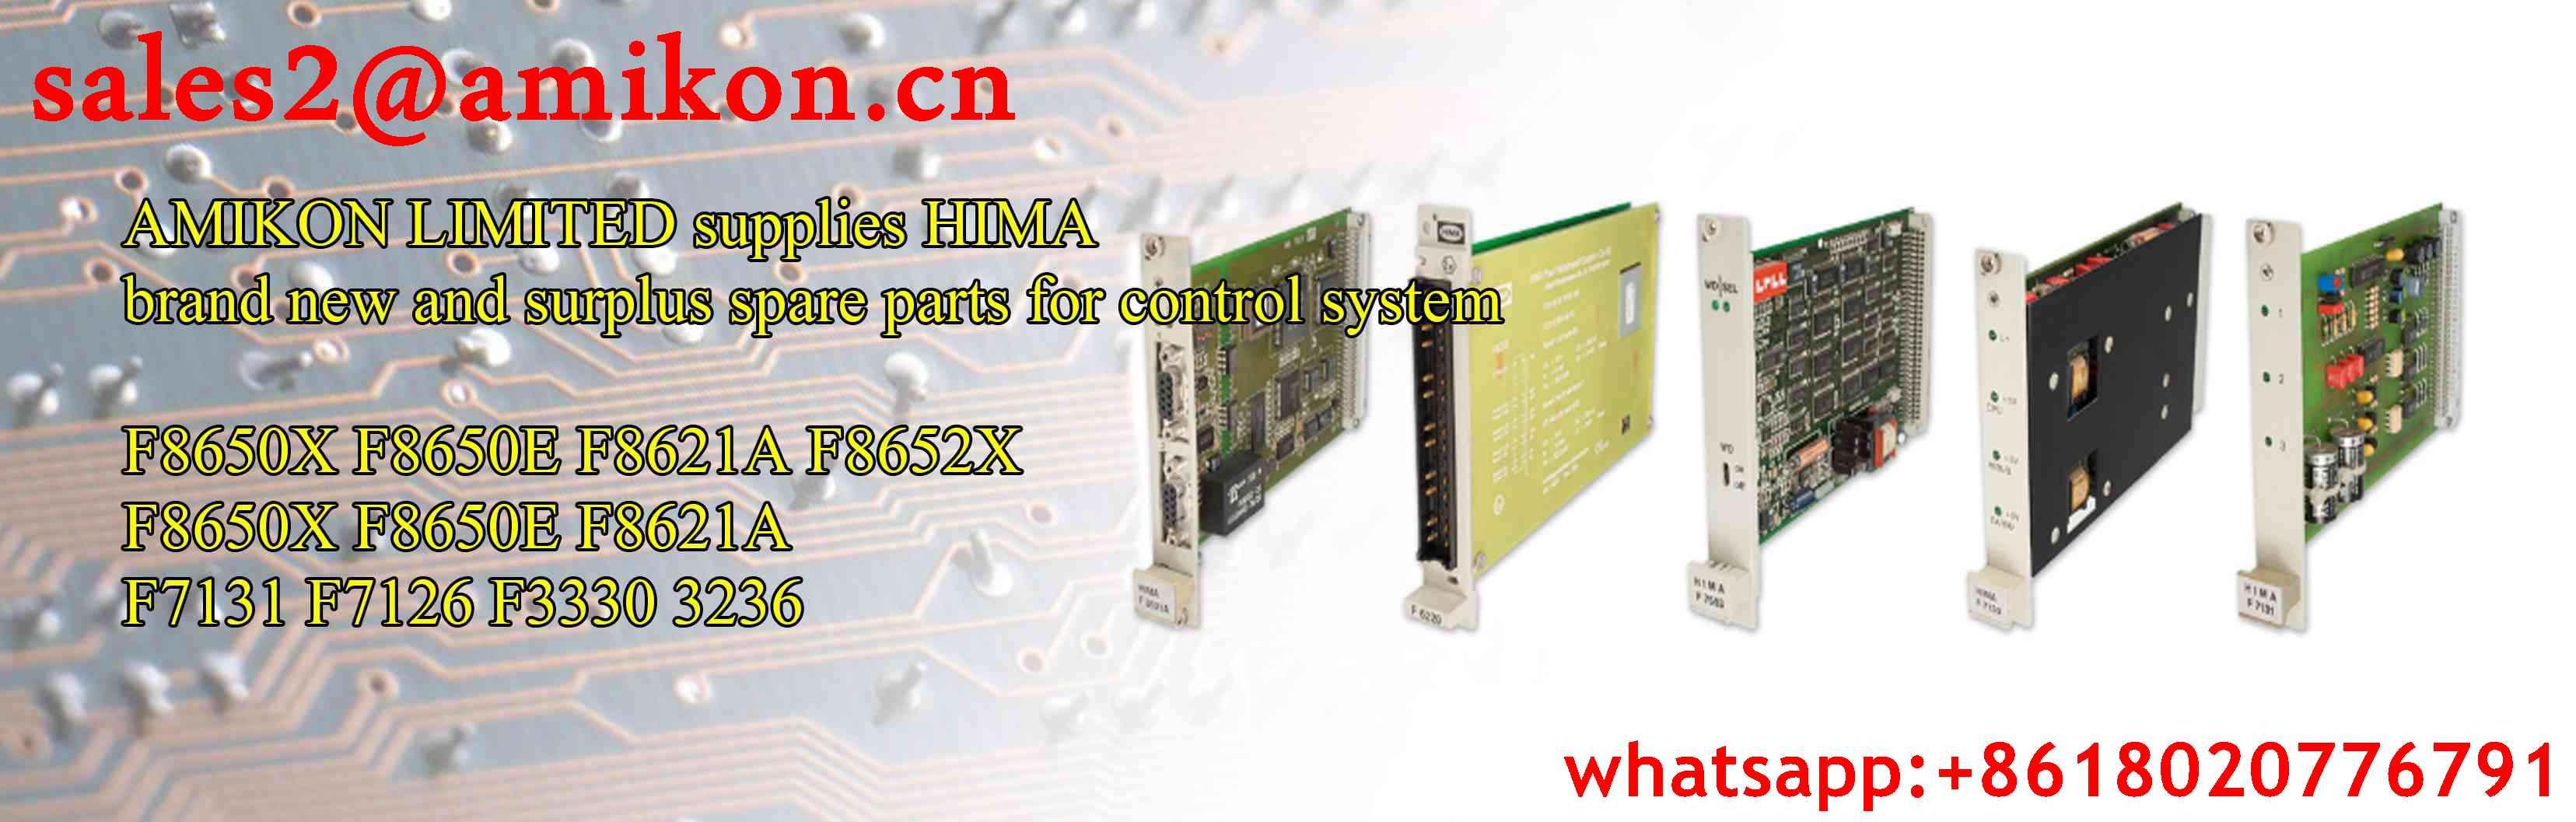 Abb Yb560103 Bd Dsqc223 I O Card Plc Dcsindustry Control System Overcurrent Relay Module China